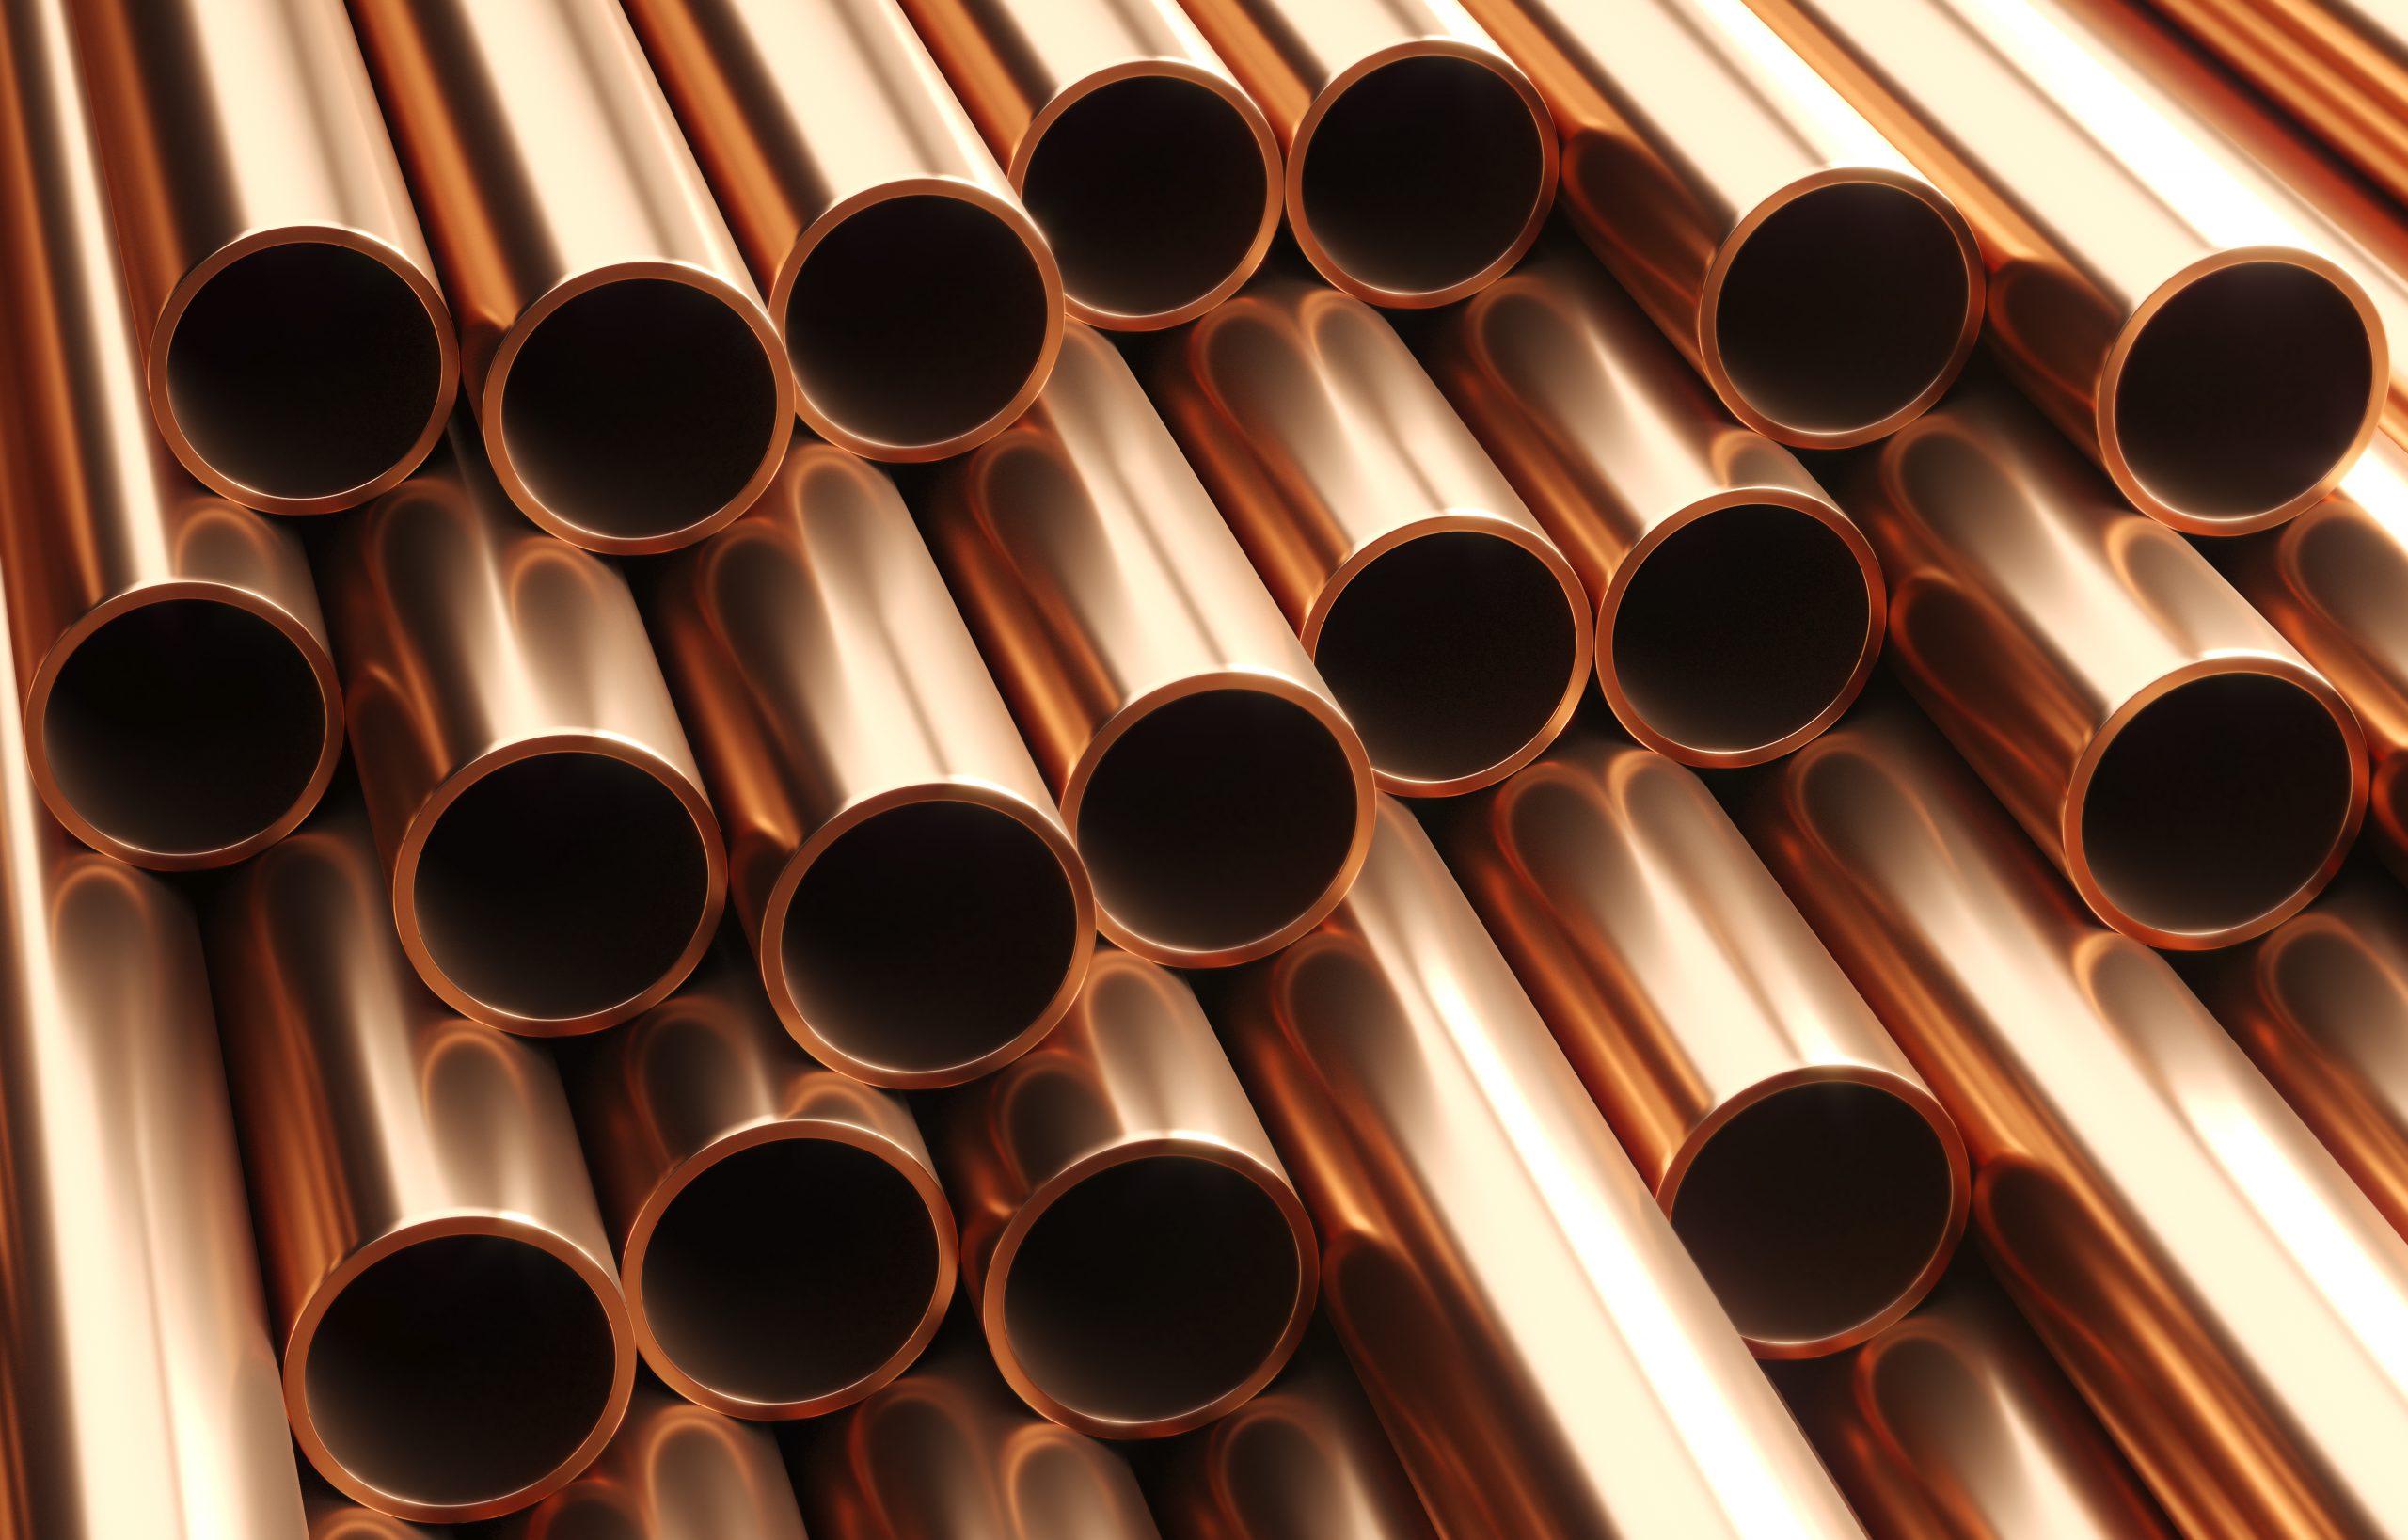 Kupferprodukte